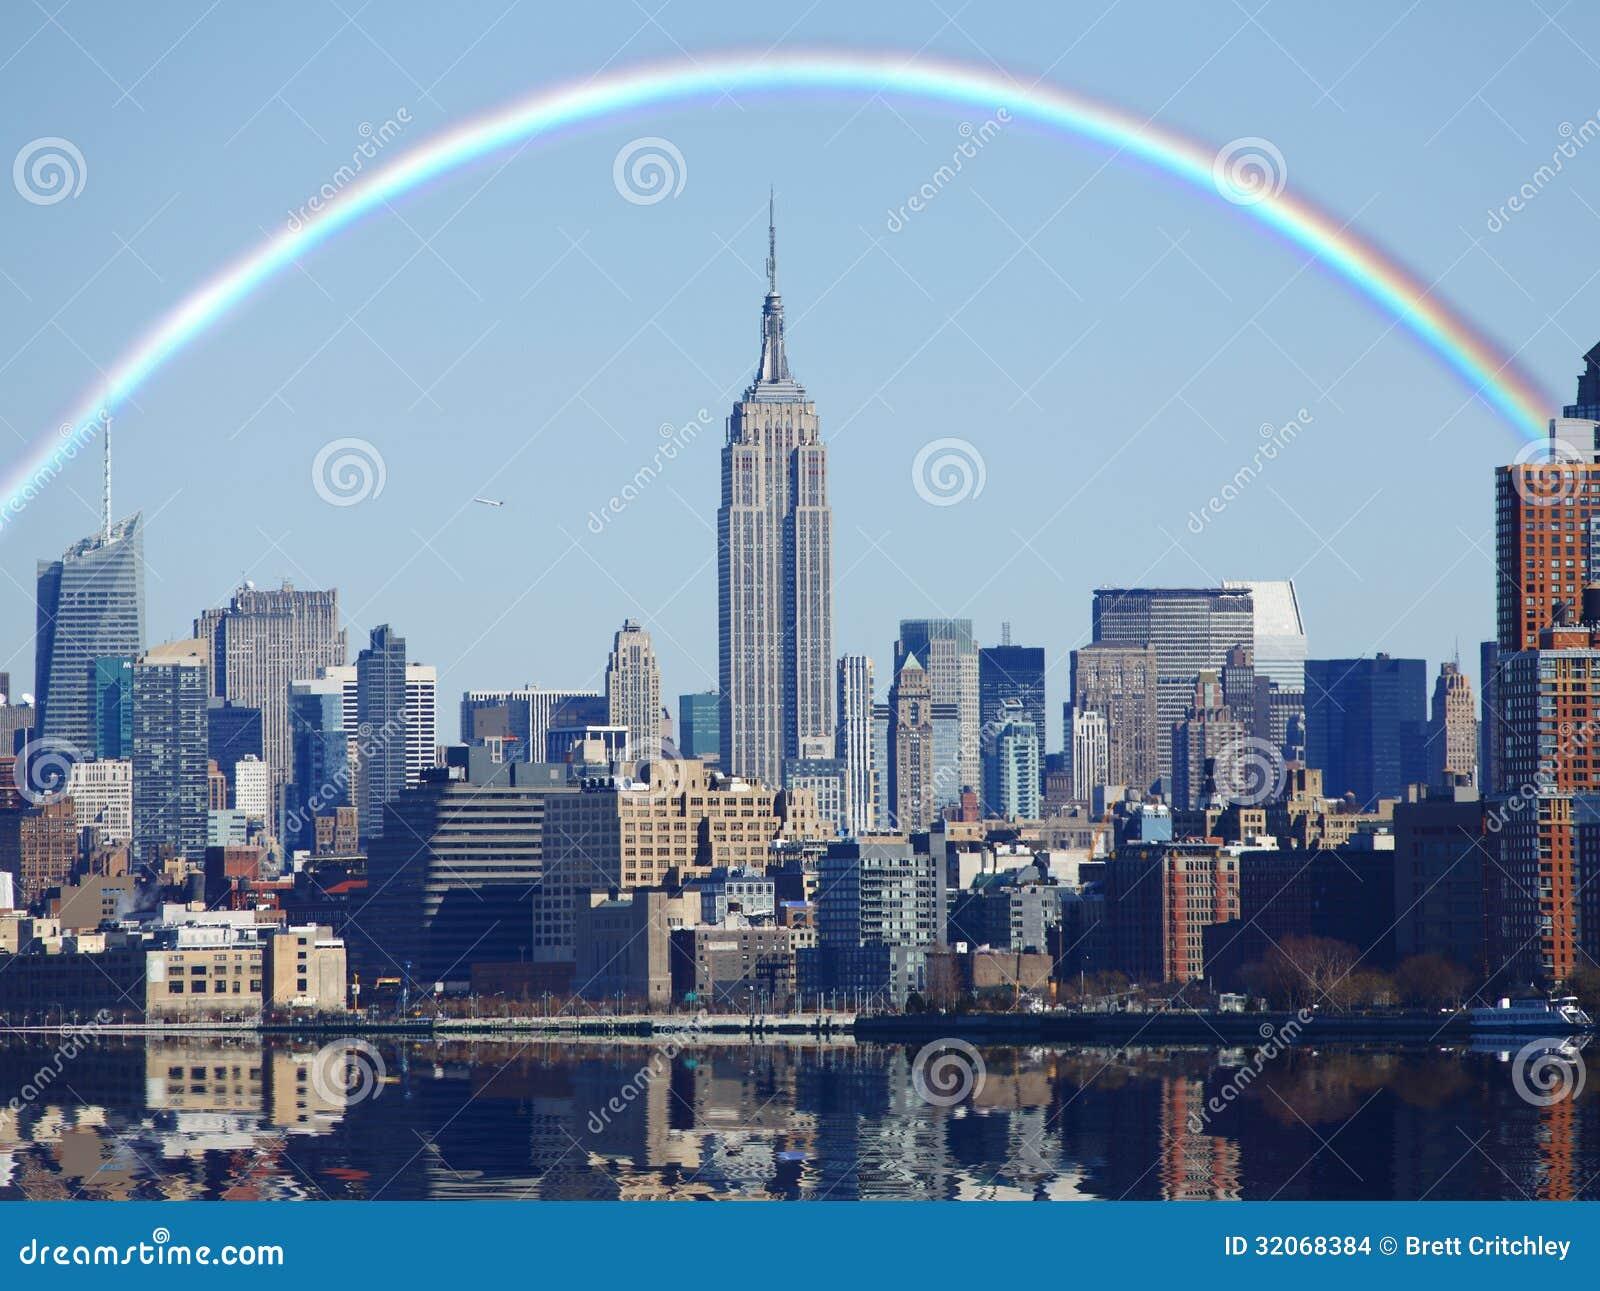 Rainbow over new york skyline stock photo image of cityscape